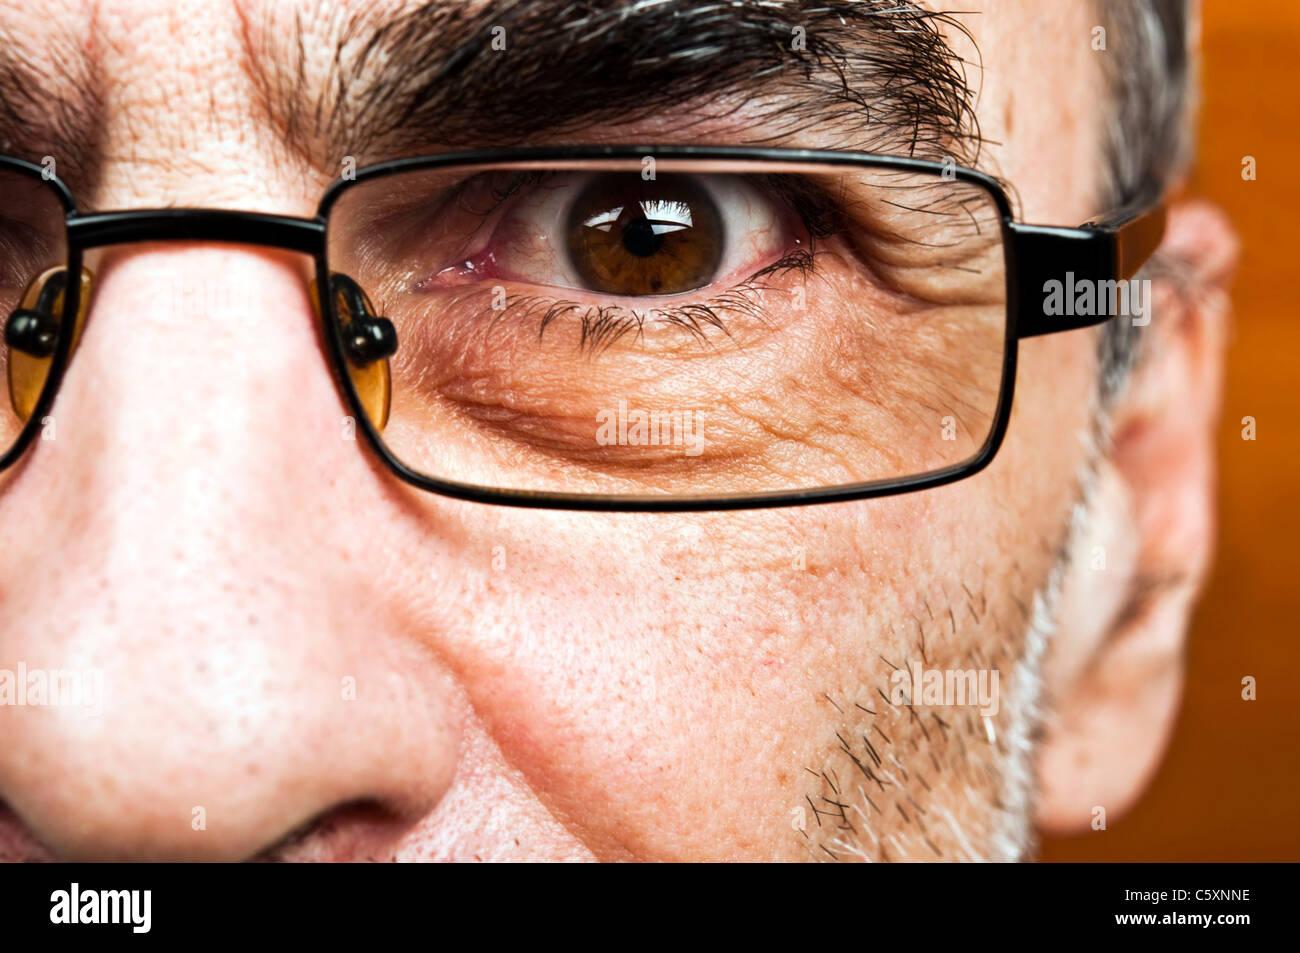 Male eye glasses close up - Stock Image